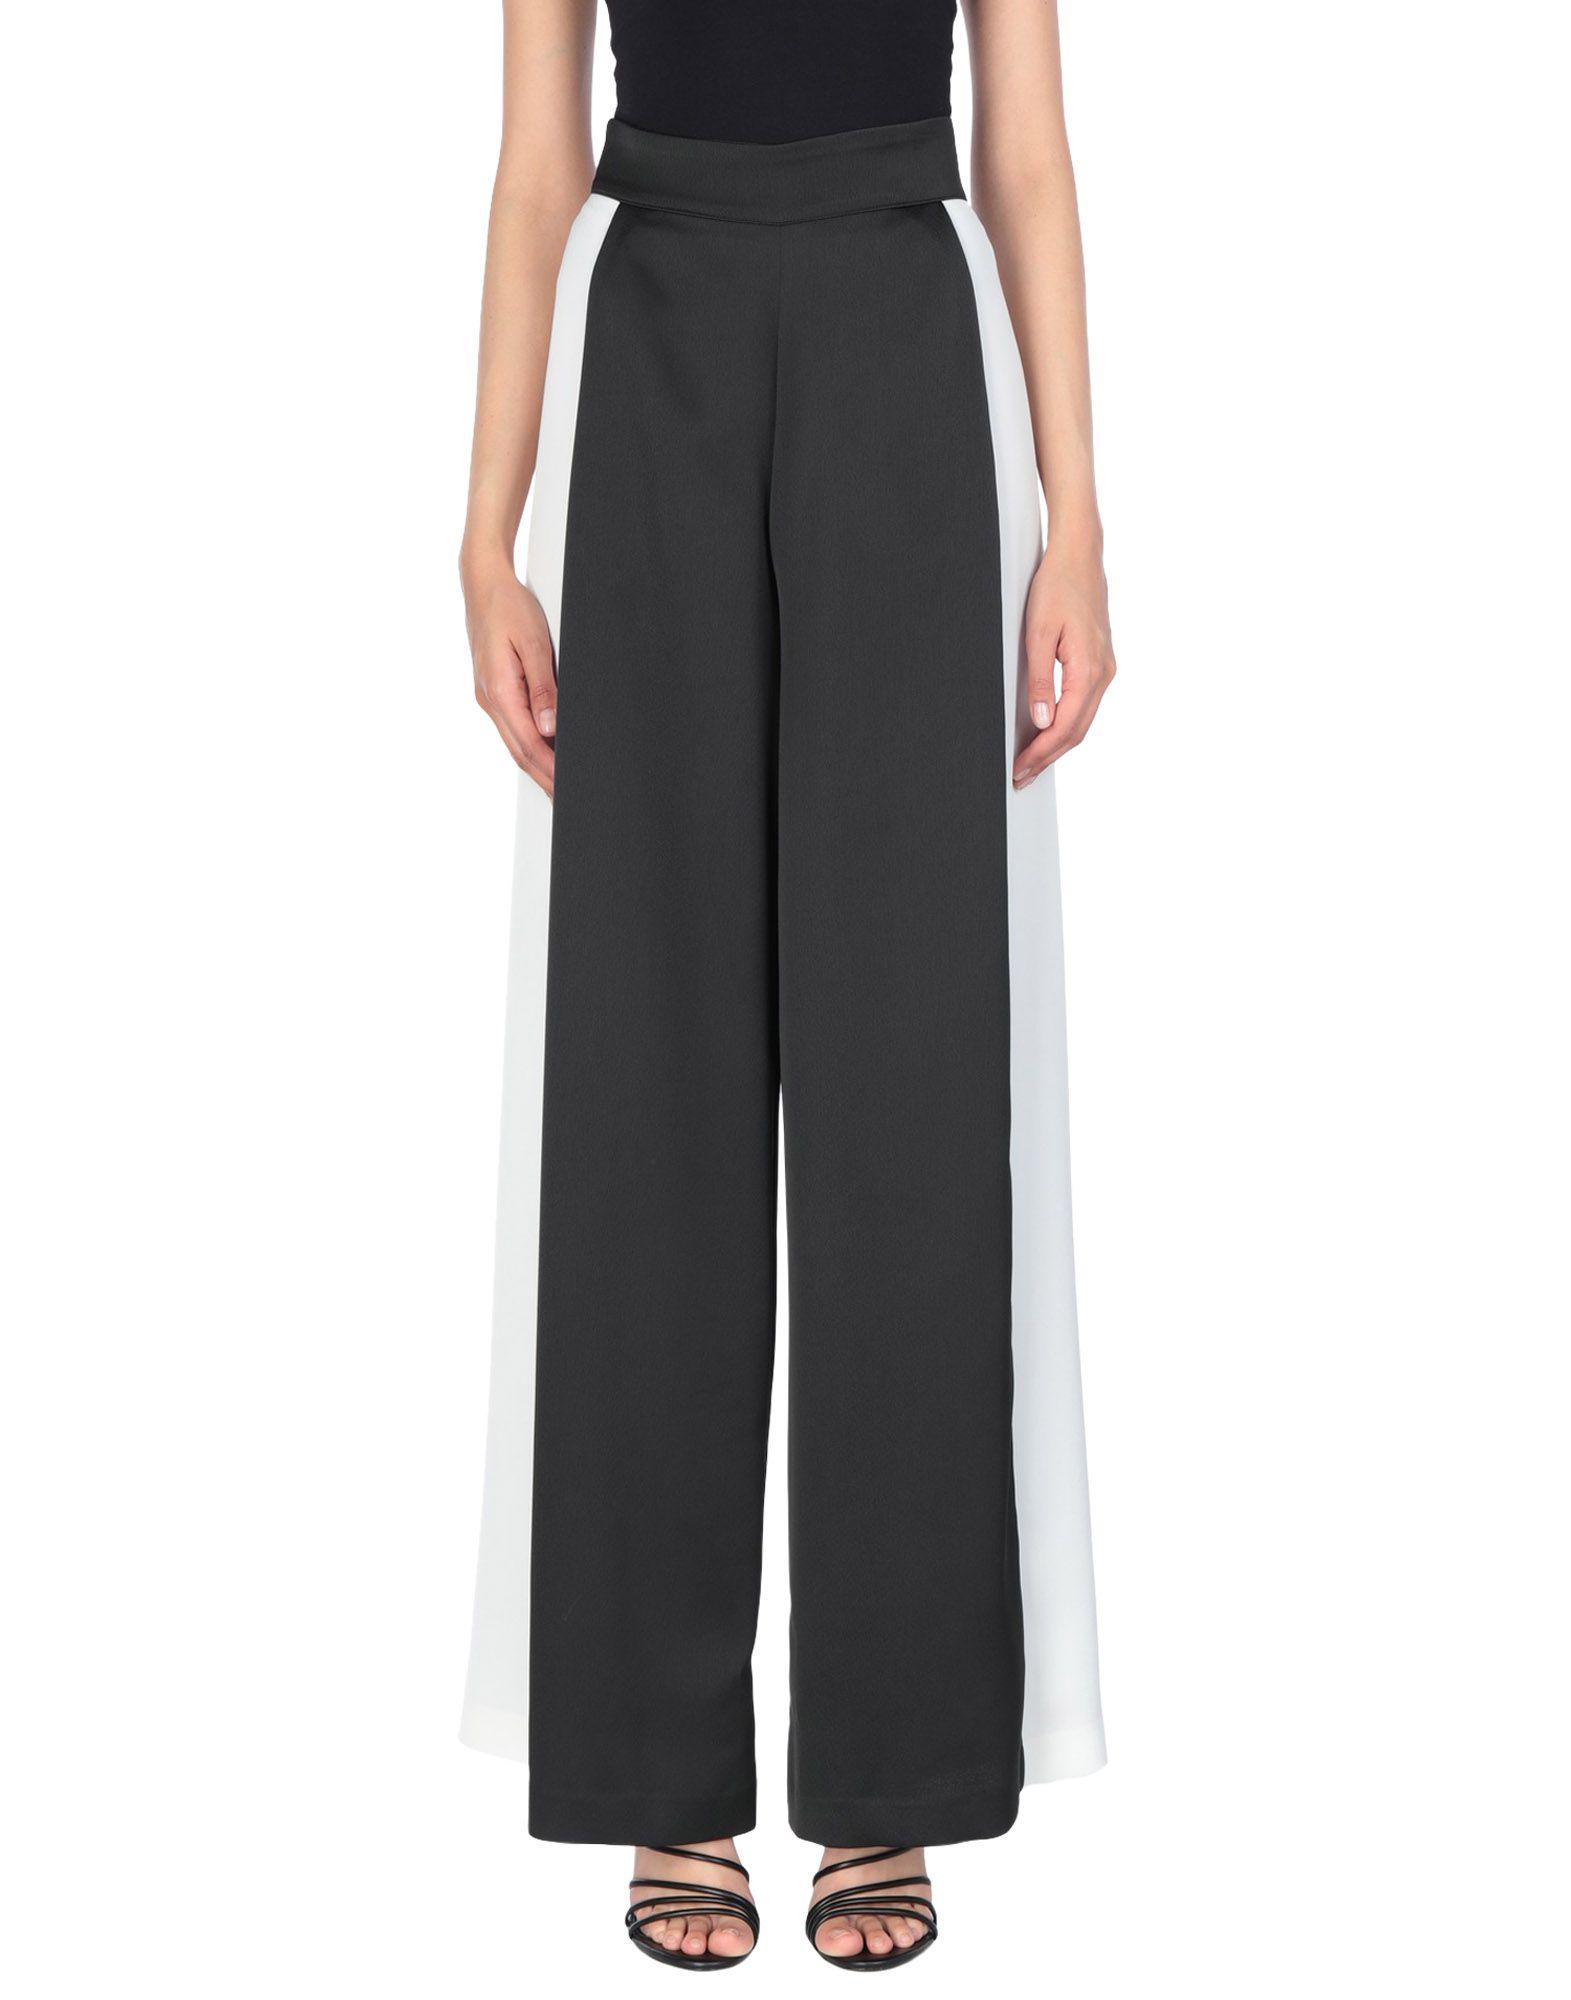 Pantalone Alessandro Legora donna donna - 13276462JI  Ladenräumung